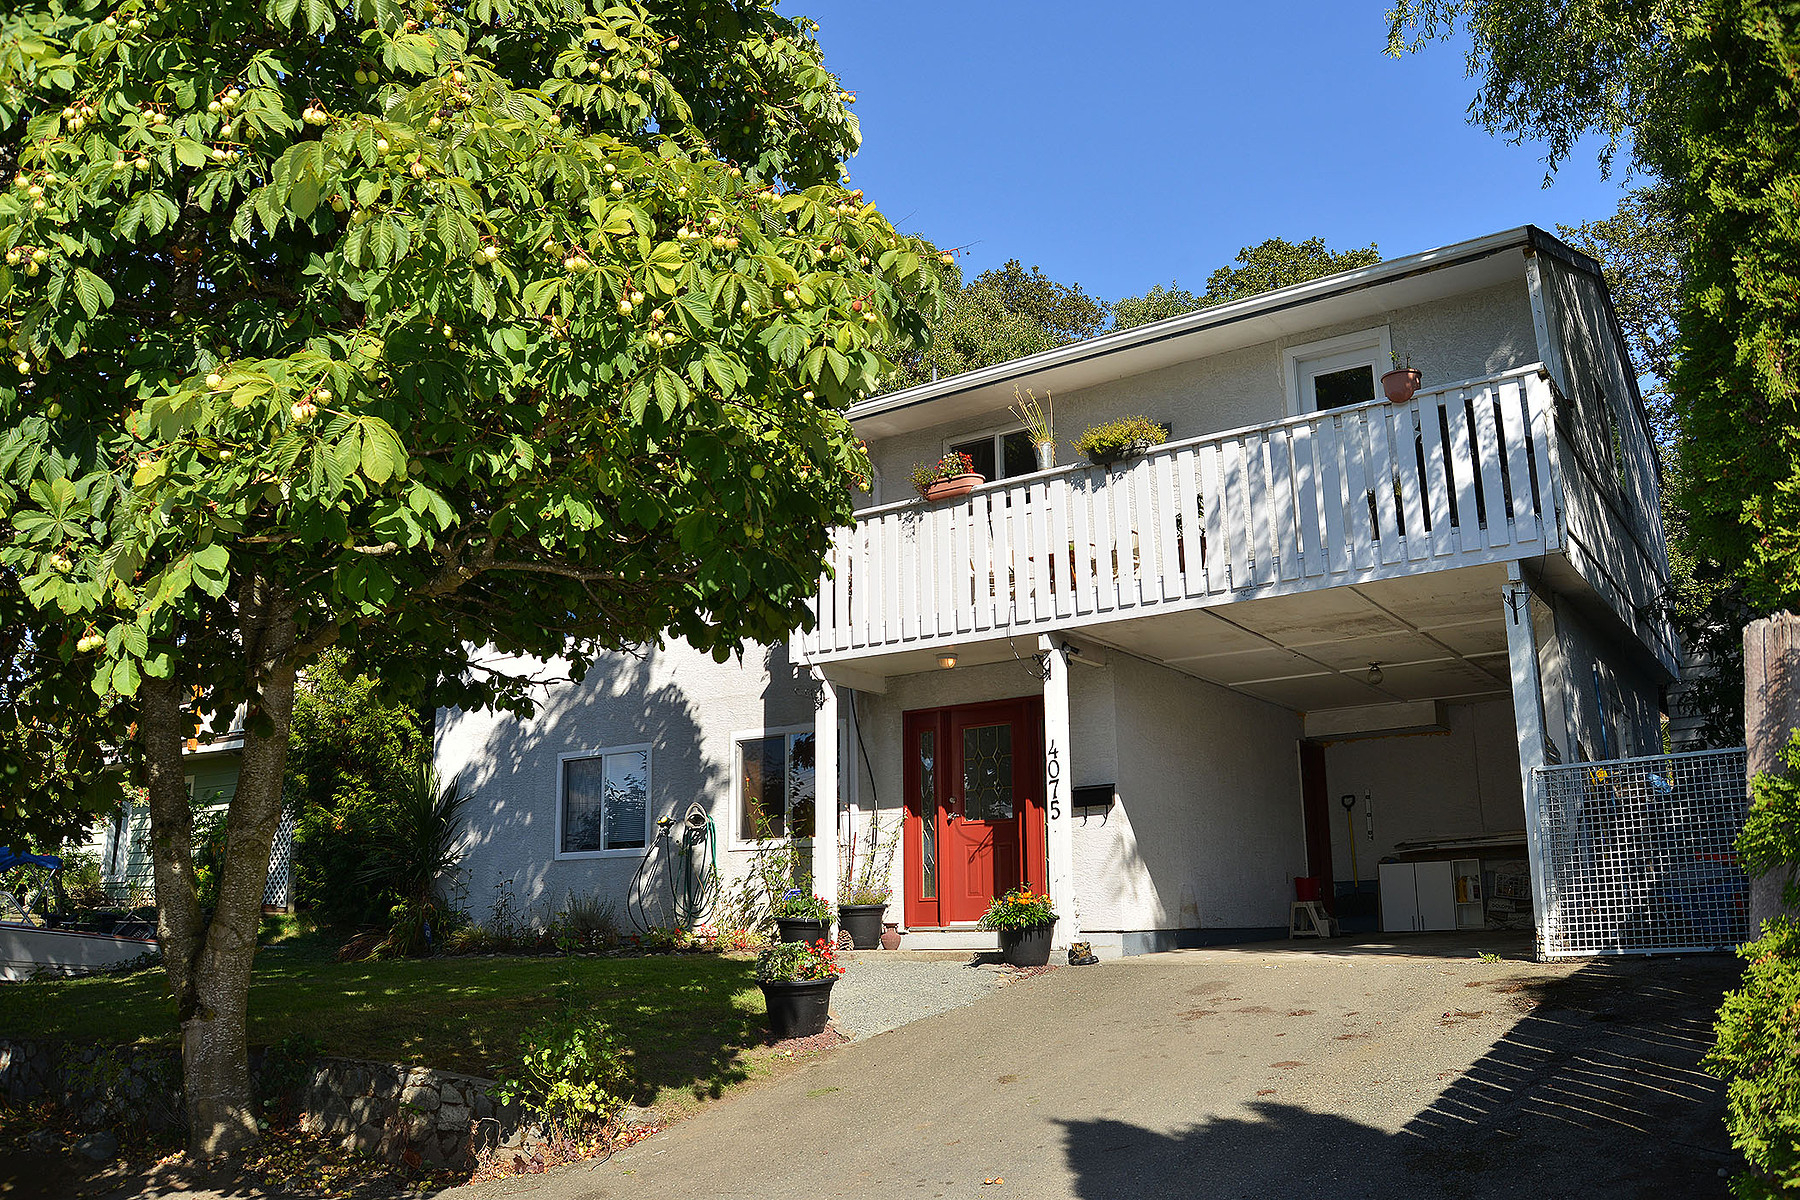 Tek Ailelik Ev için Satış at Well laid out home 4075 Carey Road Victoria, British Columbia V8Z 4G4 Kanada